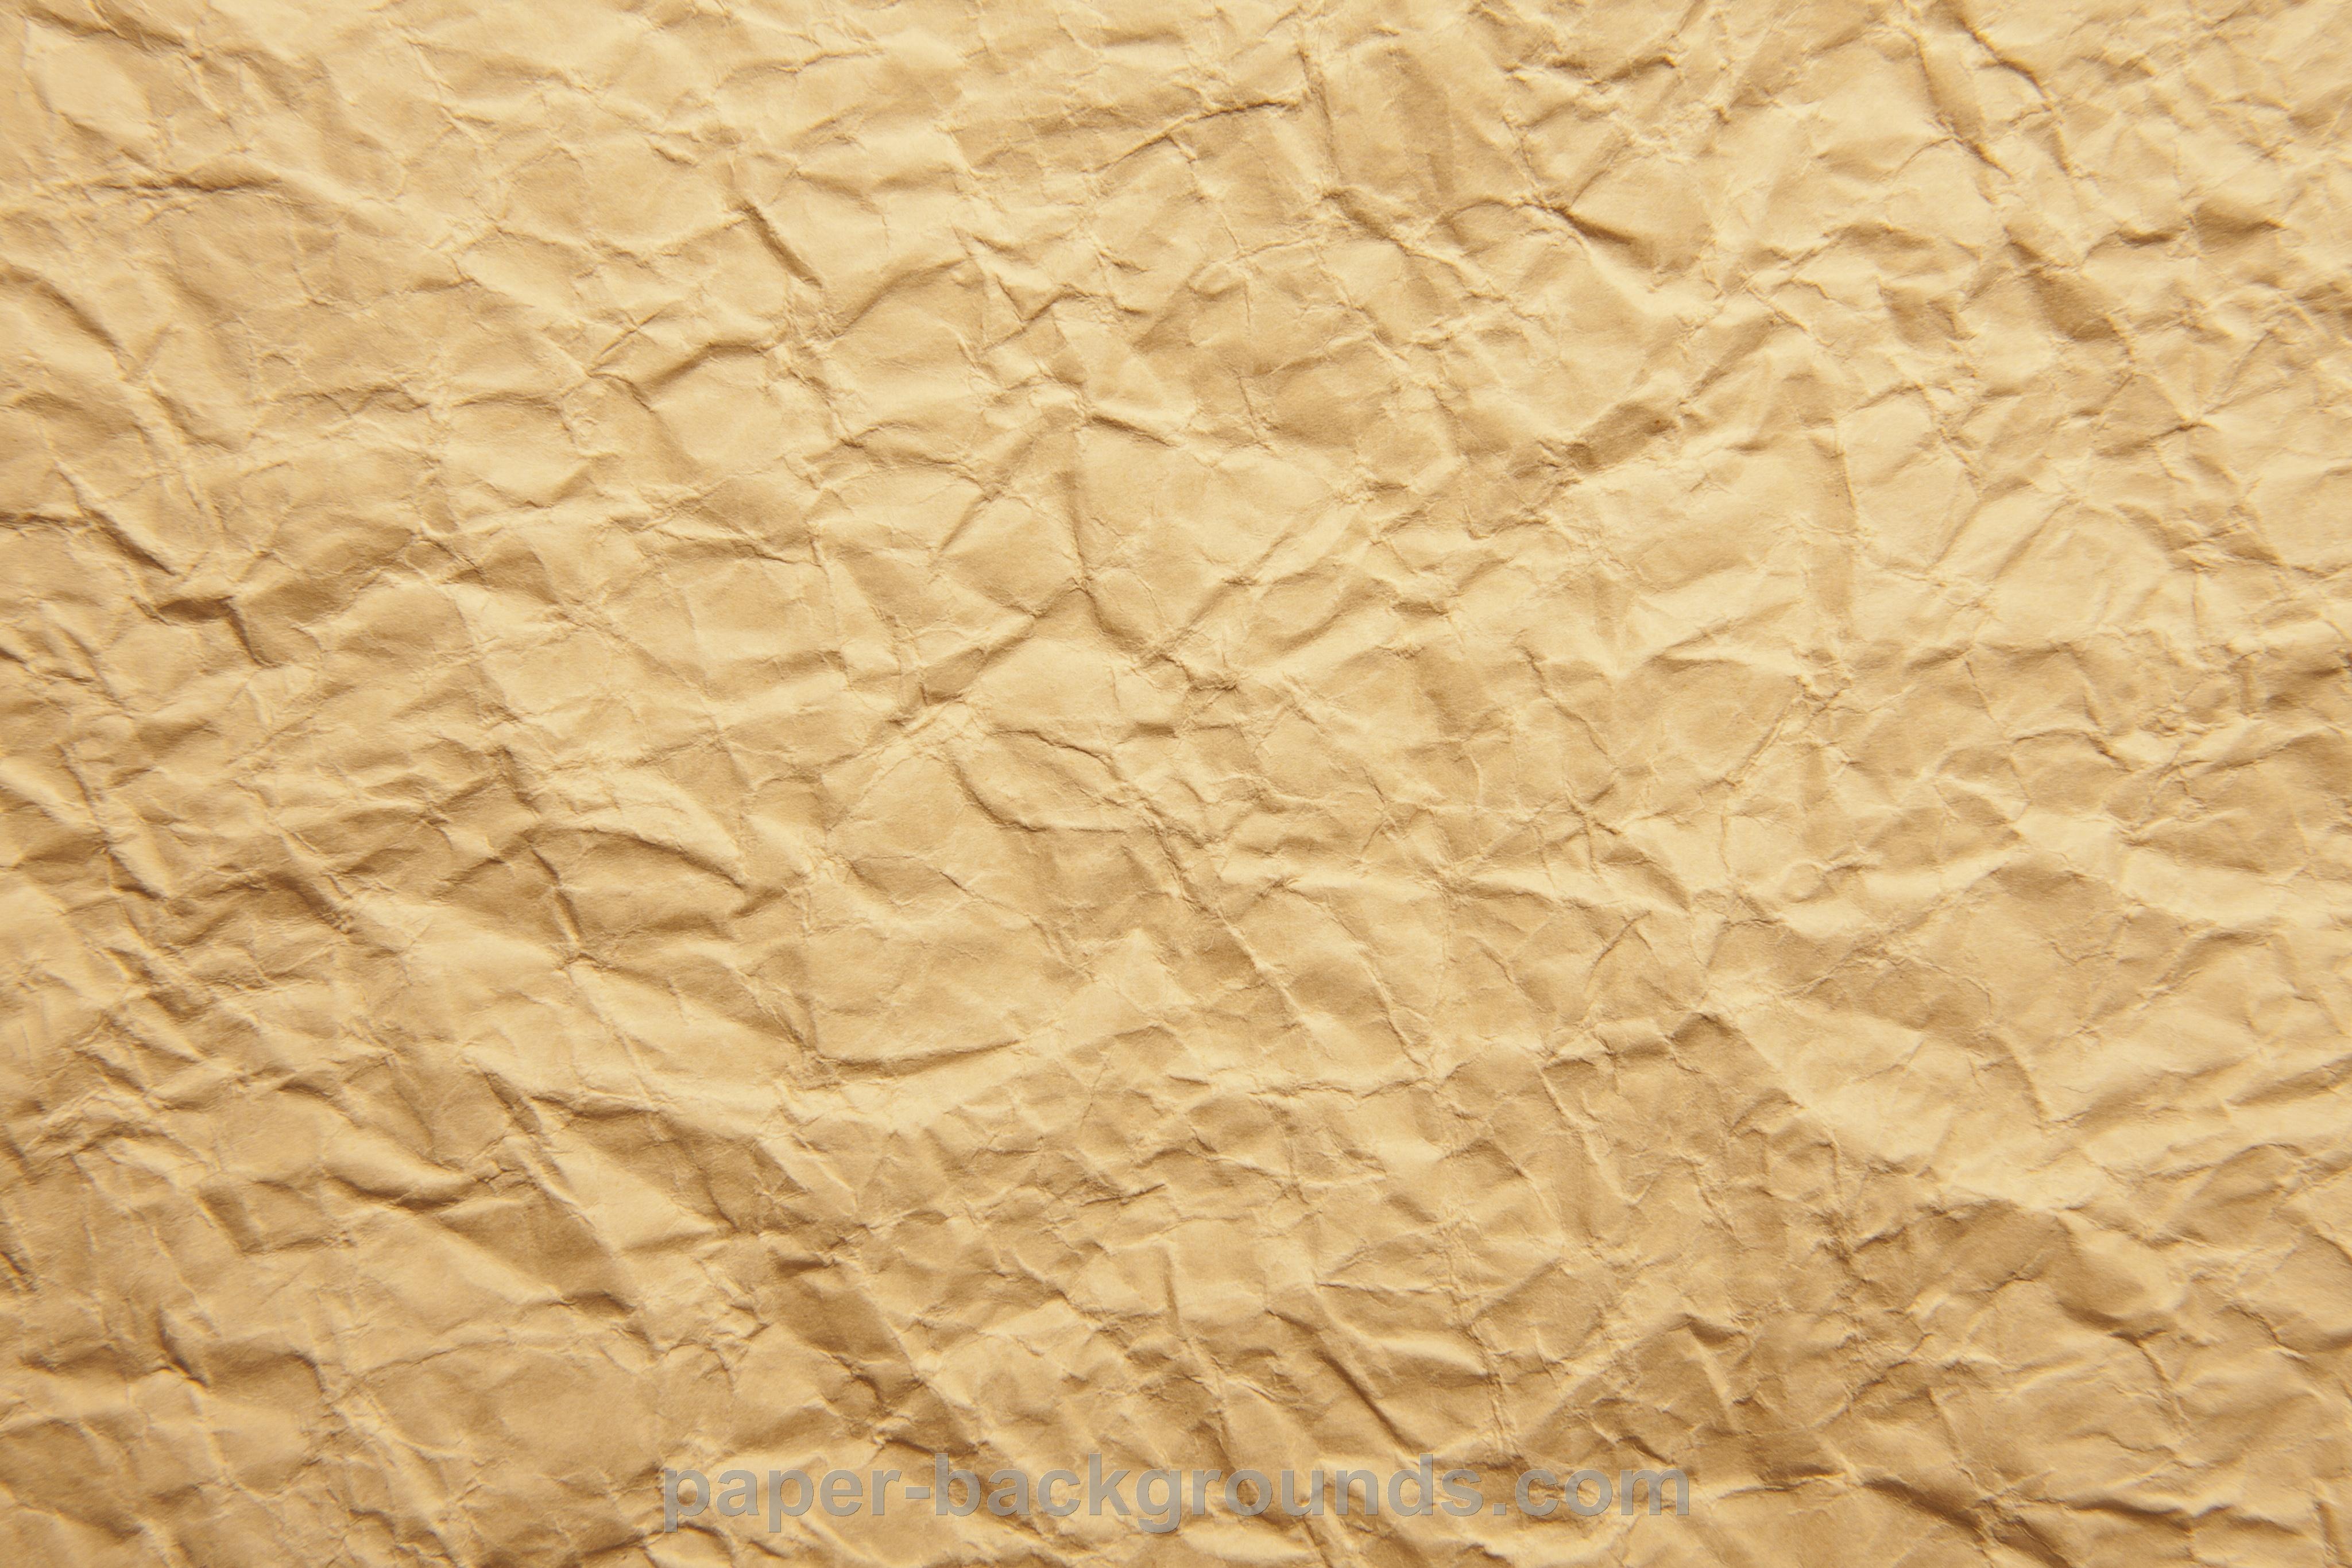 bkg crumpled paper